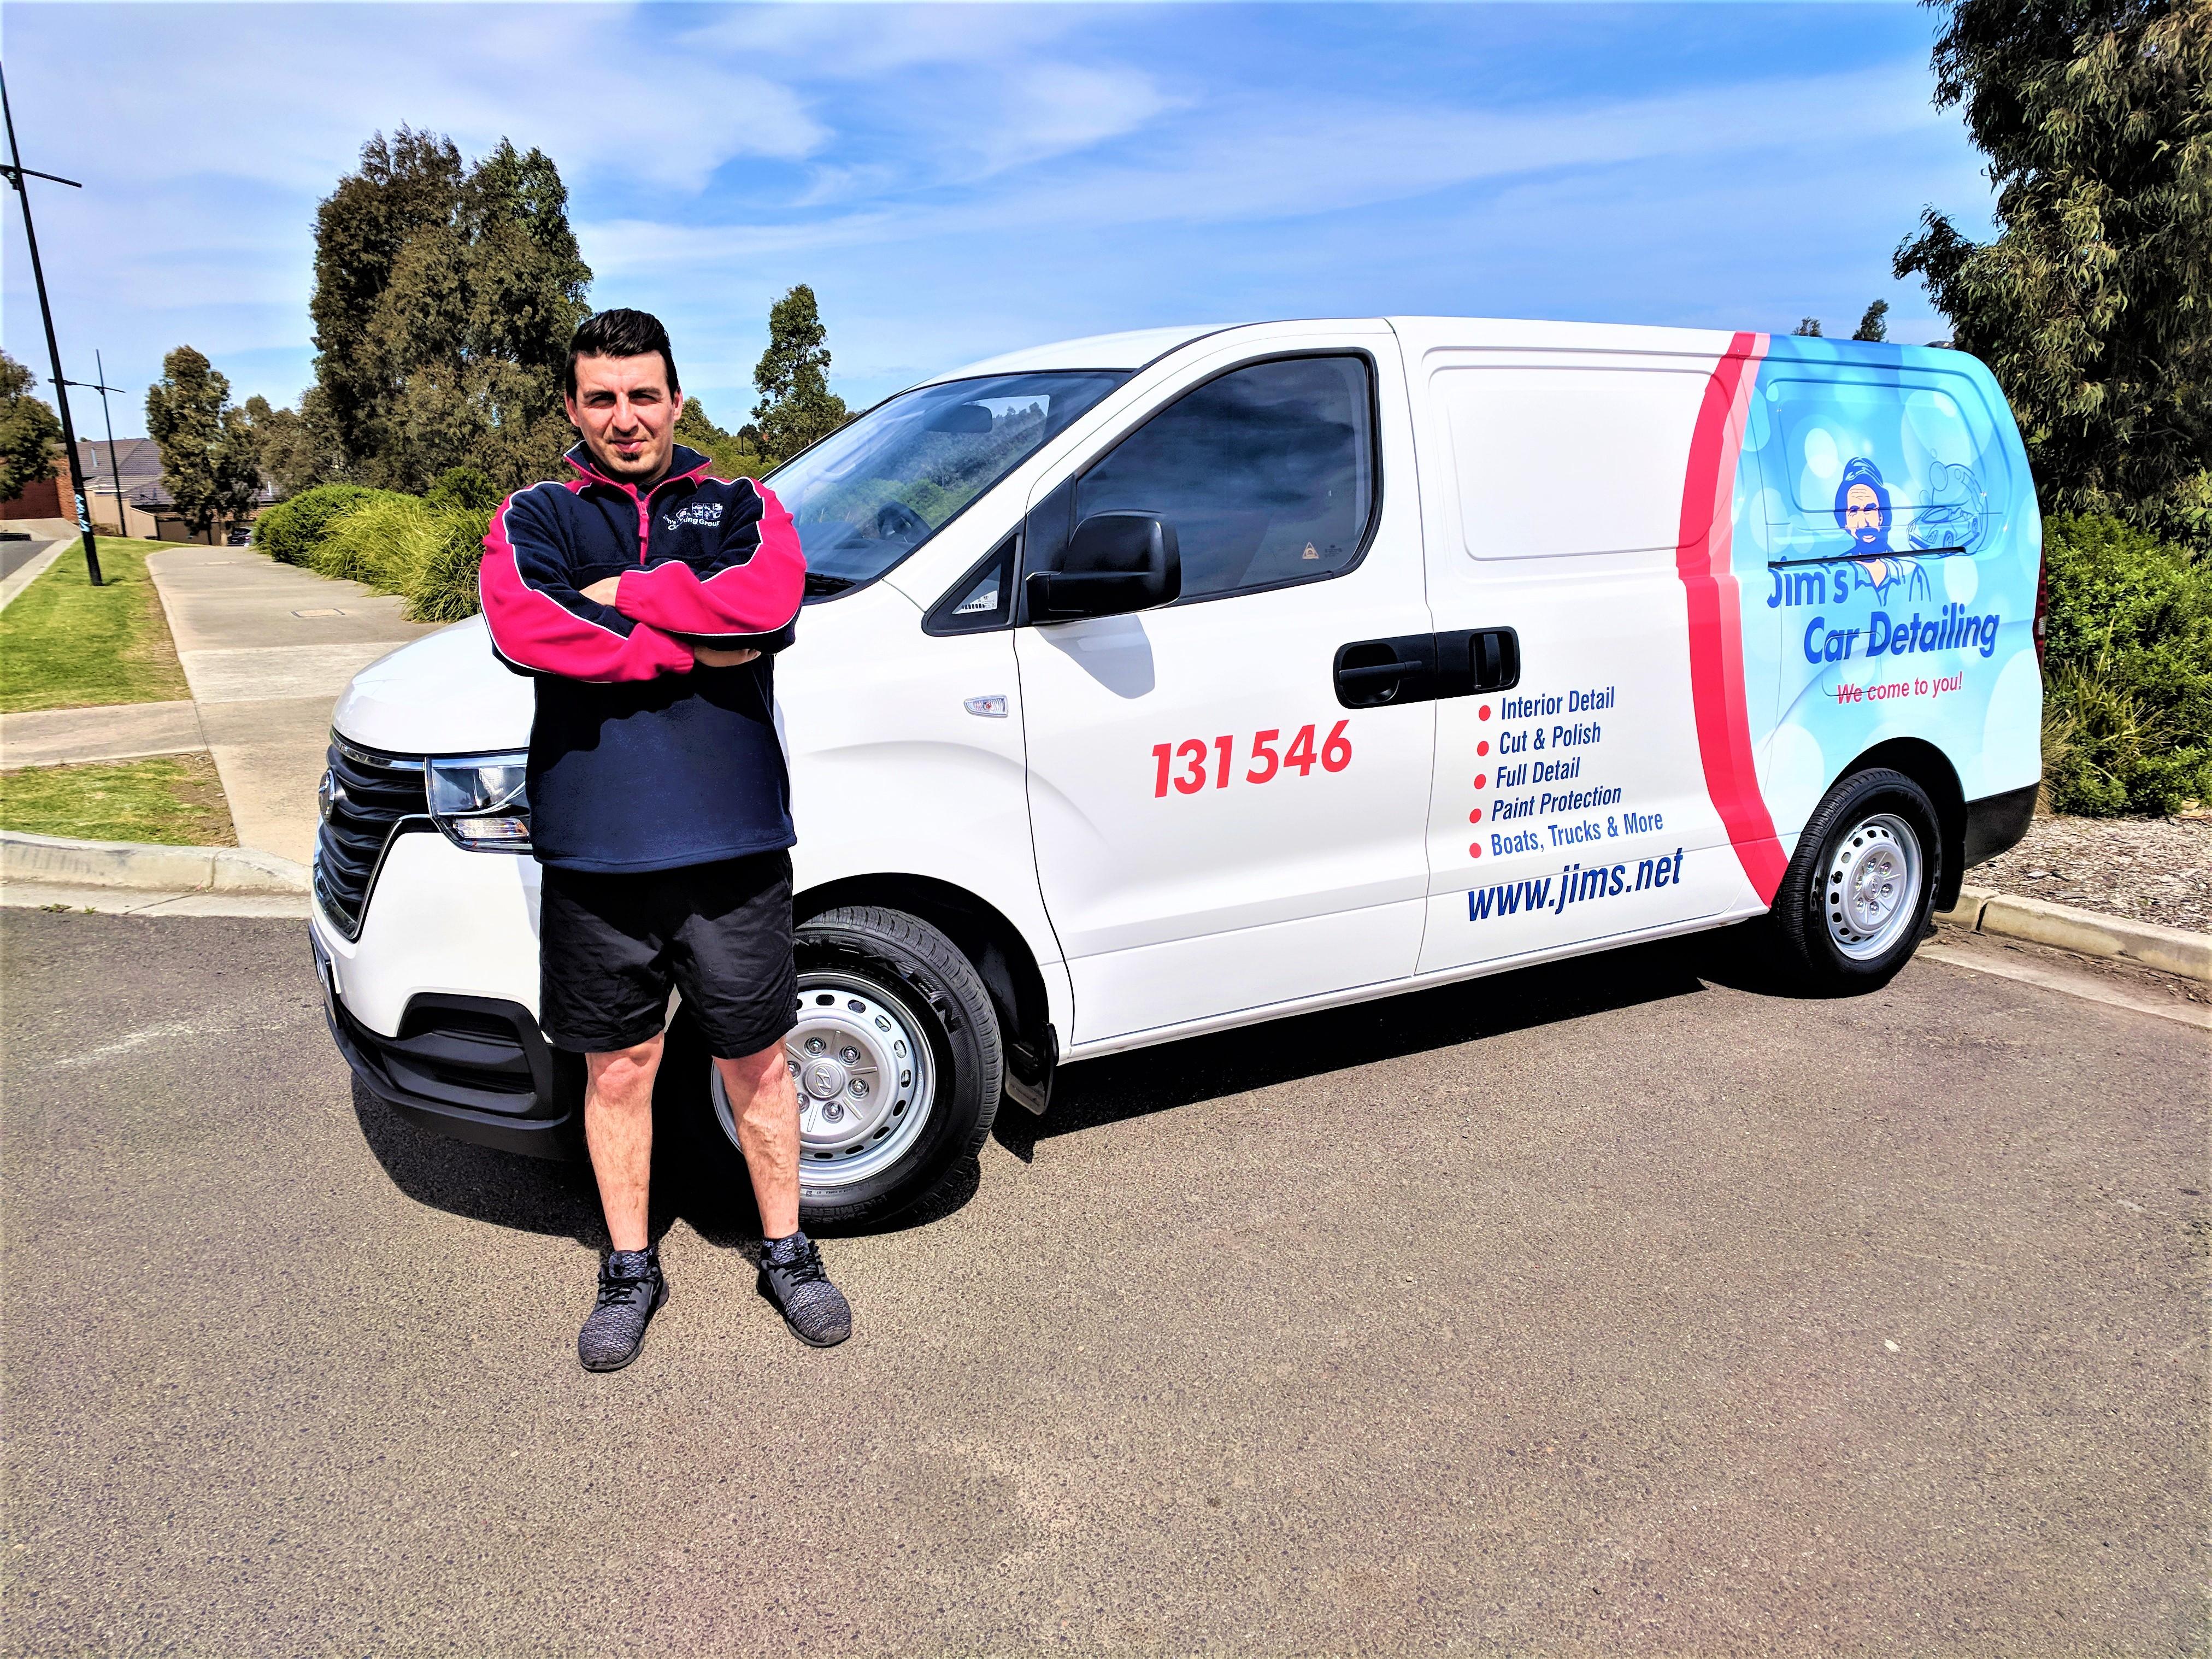 Jim's Car Detailing Southern Sydney | Mobile Car Wash ...